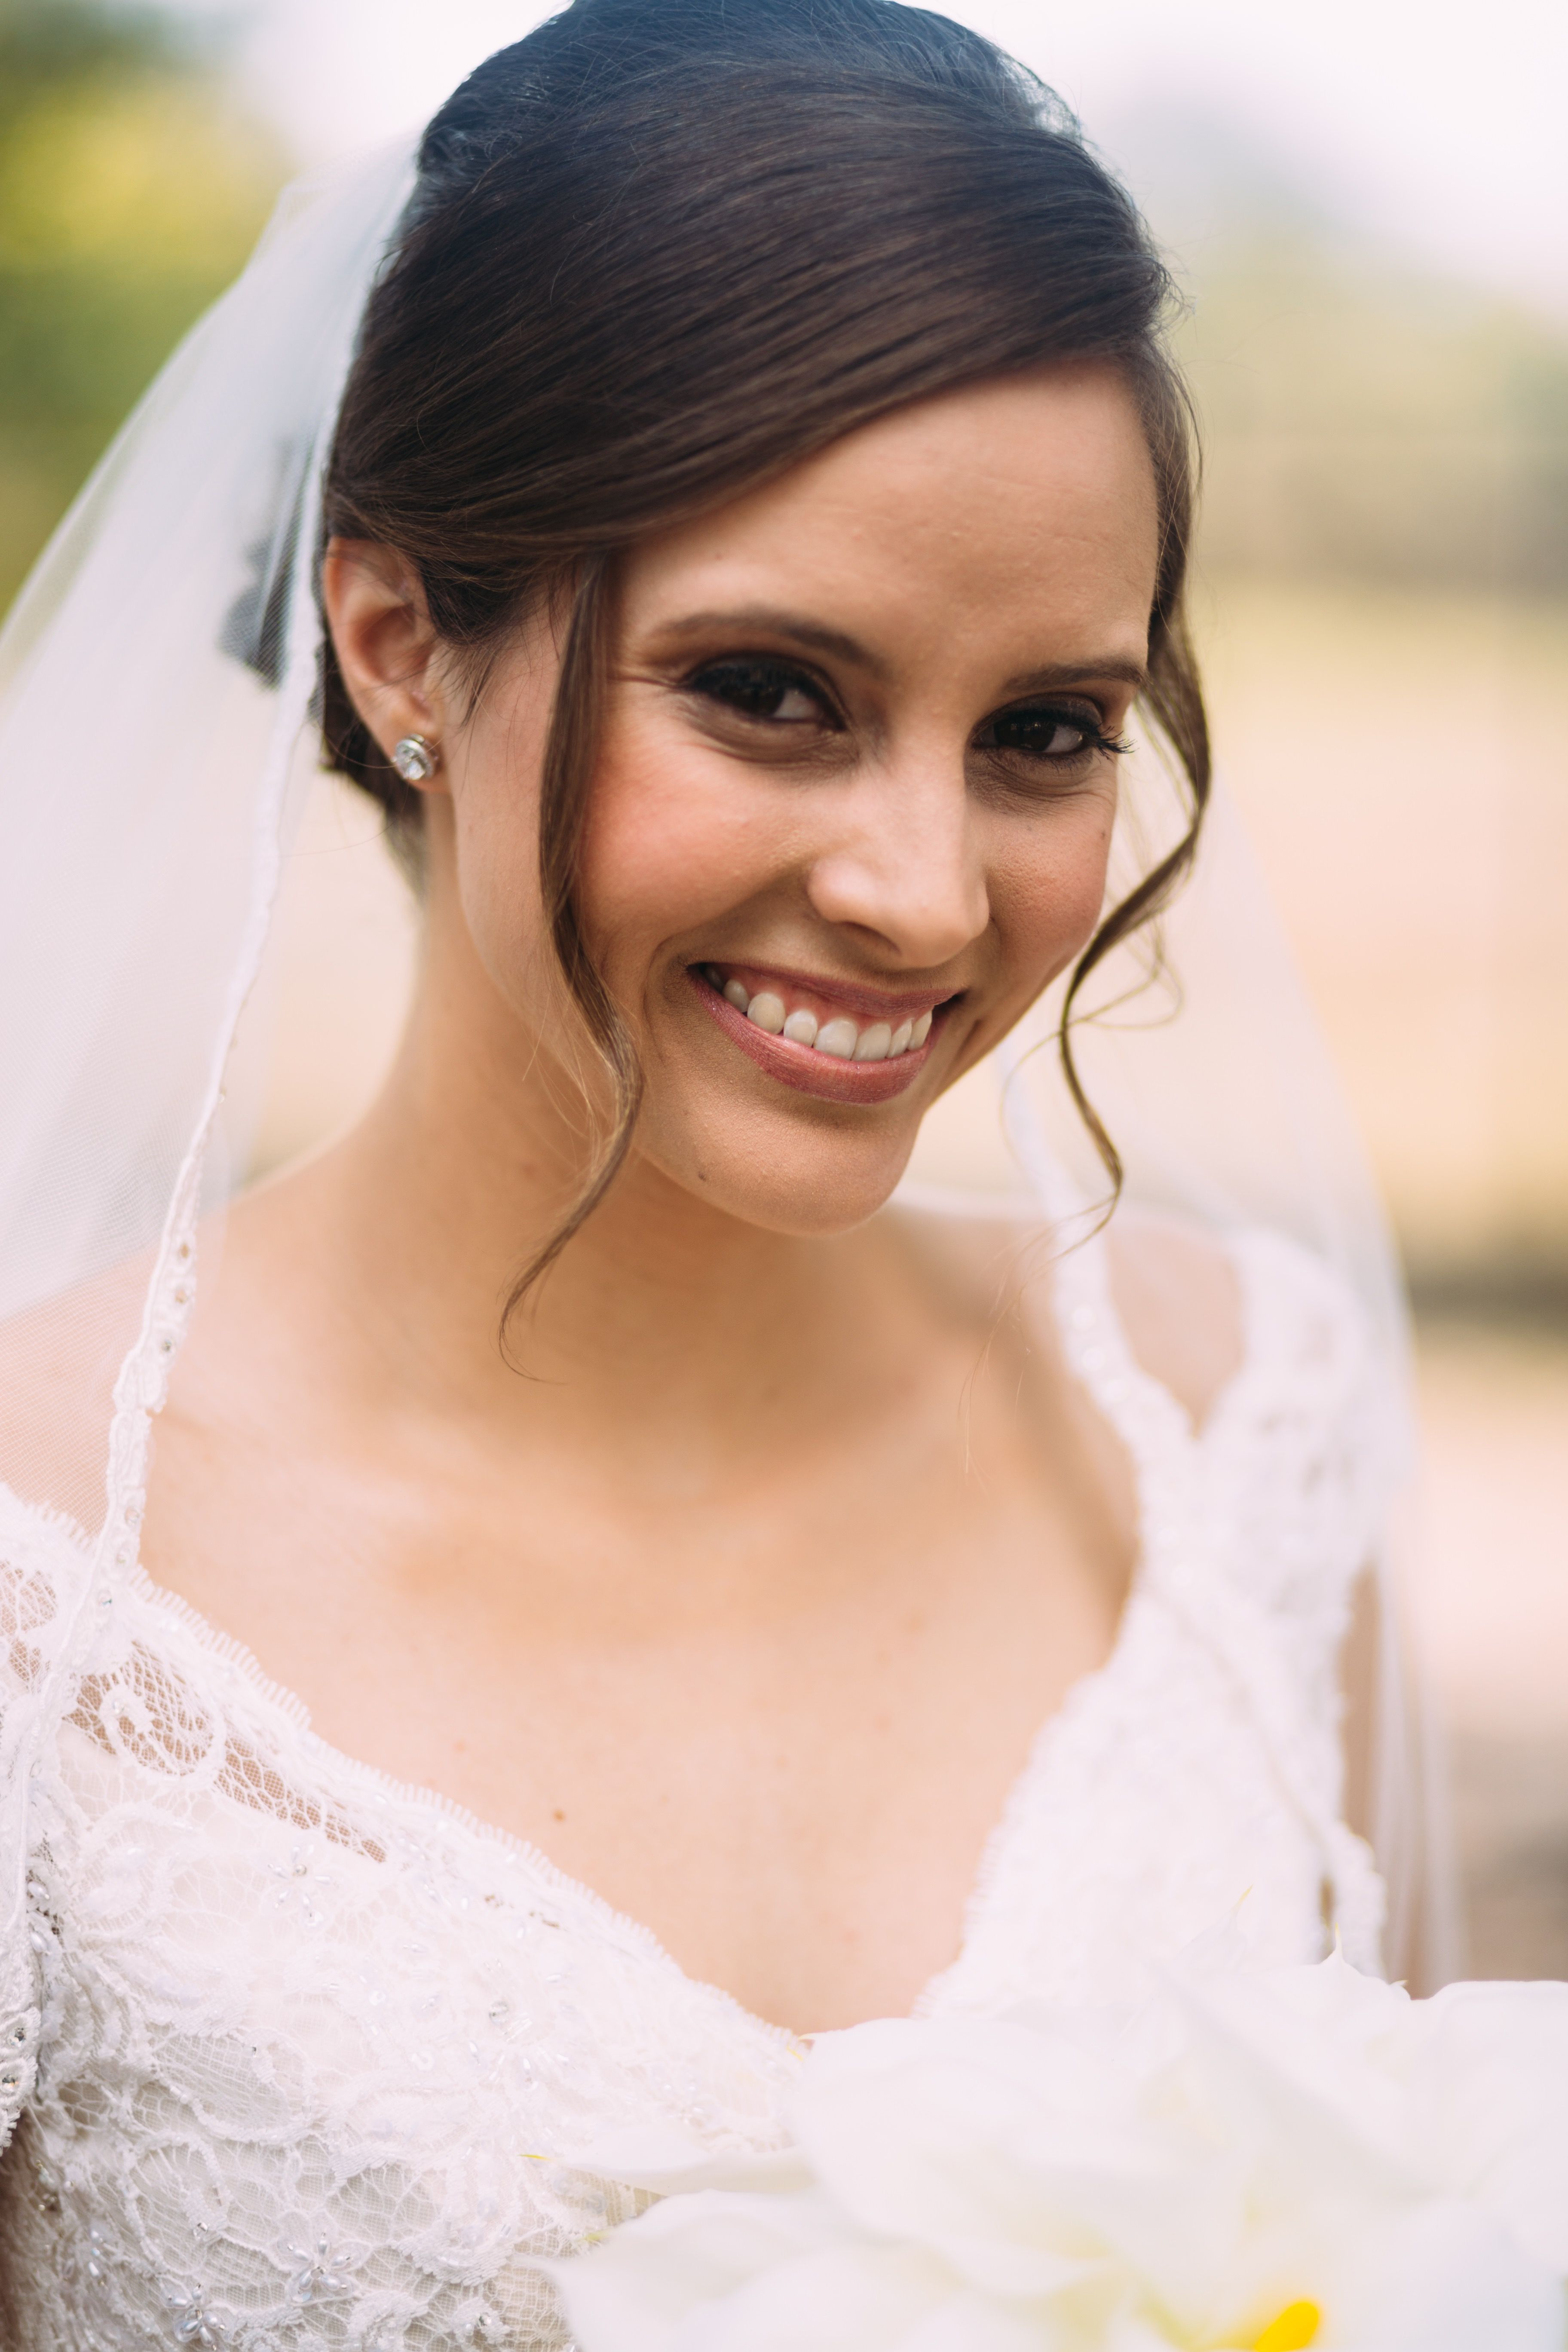 Bridal wedding makeup Beautiful wedding hair, Wedding